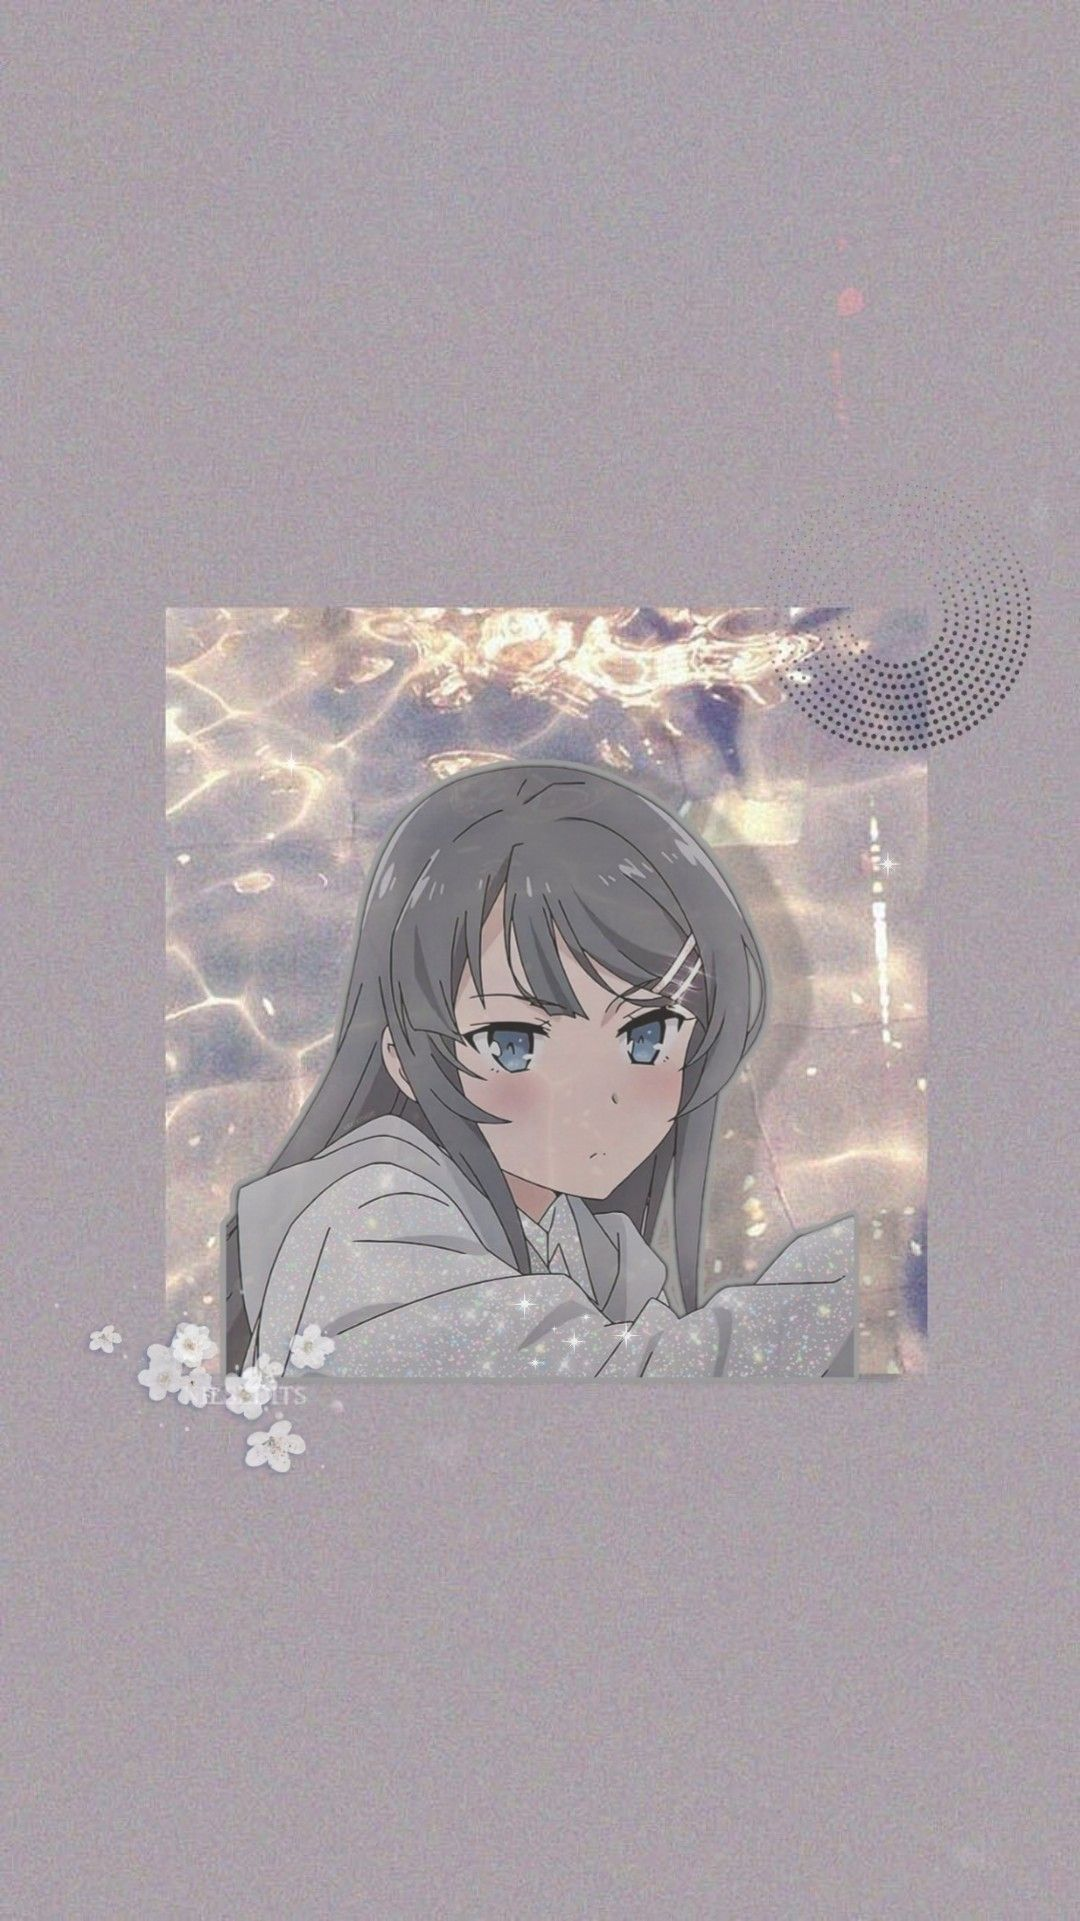 Mai Sakurajima Wallpaper Bunny Girl Senpai Anime Wallpaper Bunny Girl Mai Sakurajima